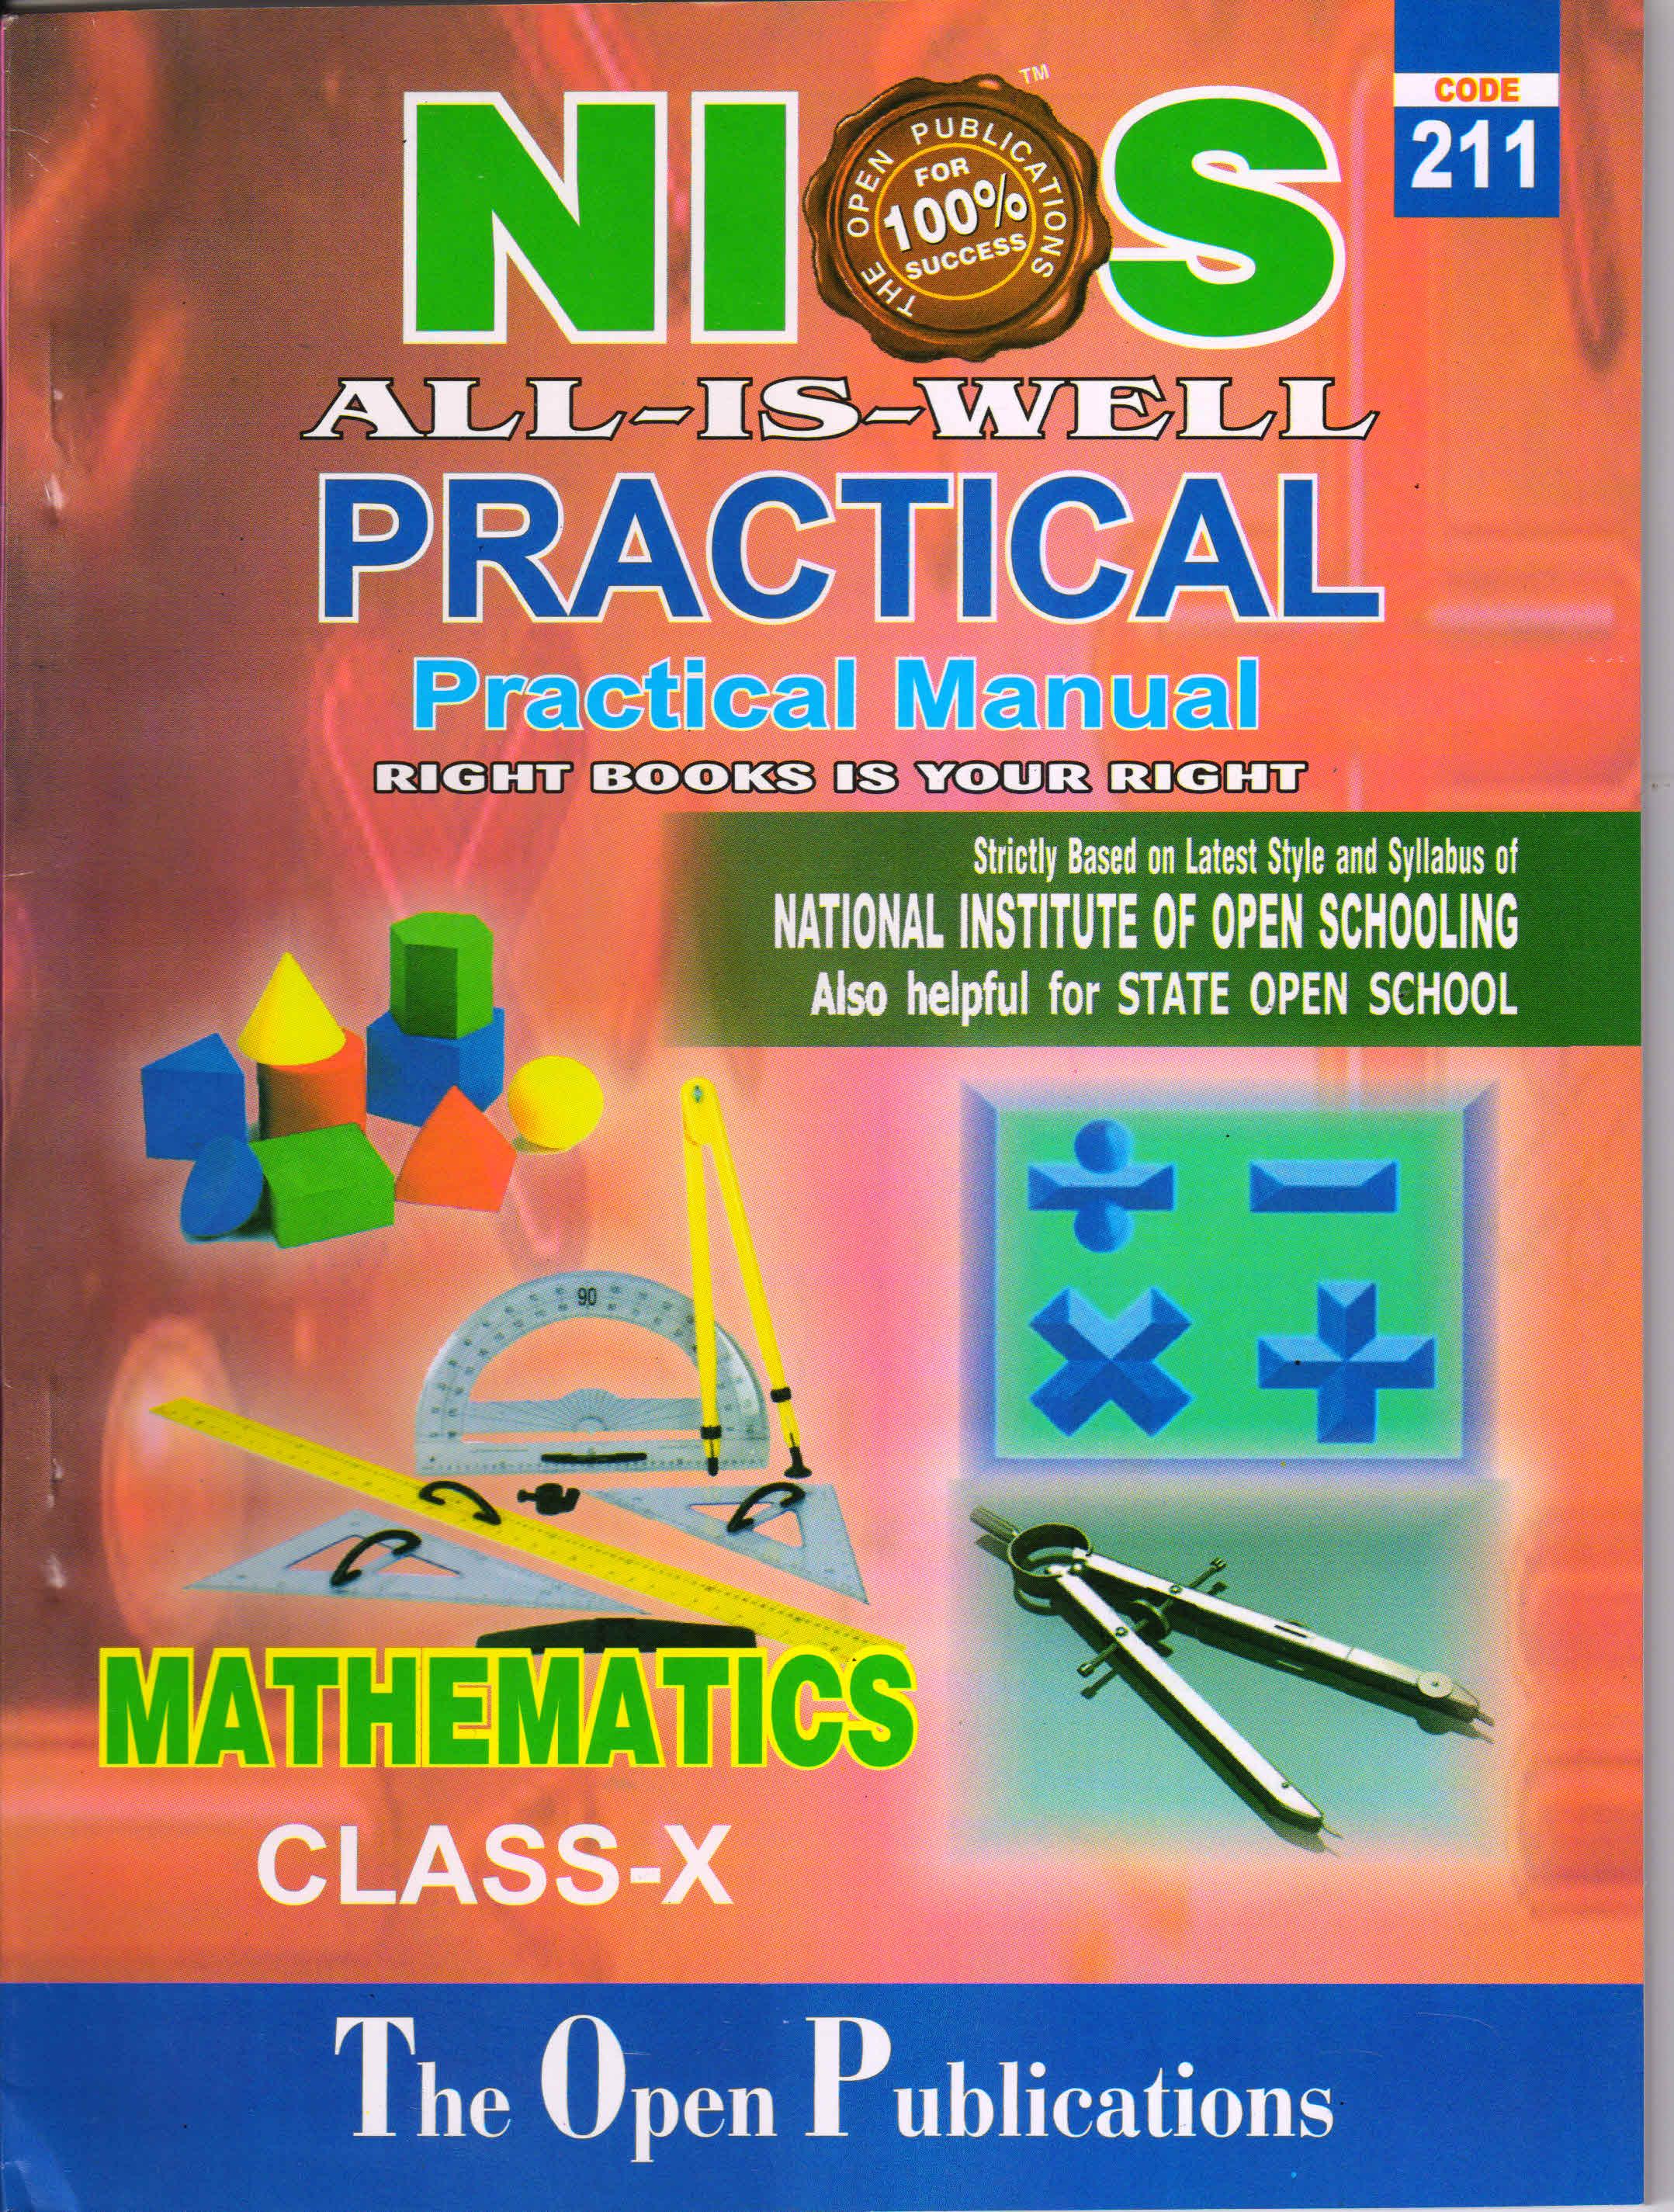 211 NIOS PRACTICAL MANUAL MATHEMATICS 211 HELP BOOK IN ENGLISH MEDIUM